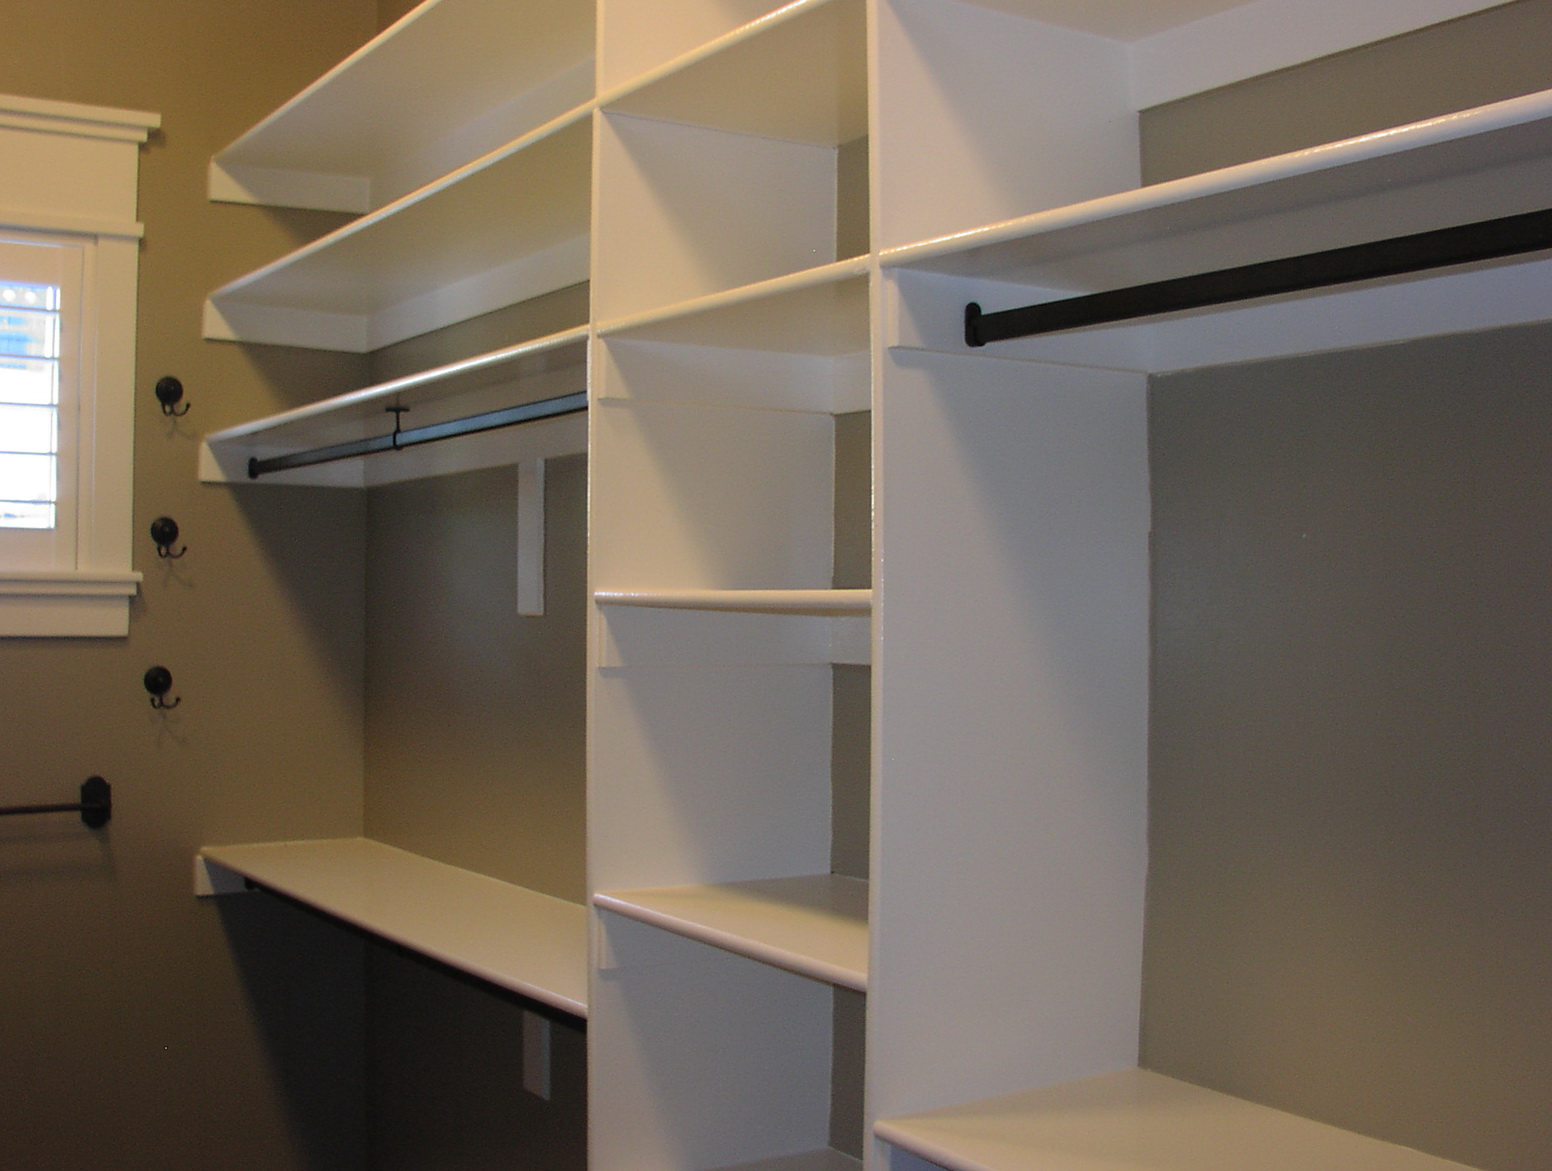 Closet Built Ins Ideas